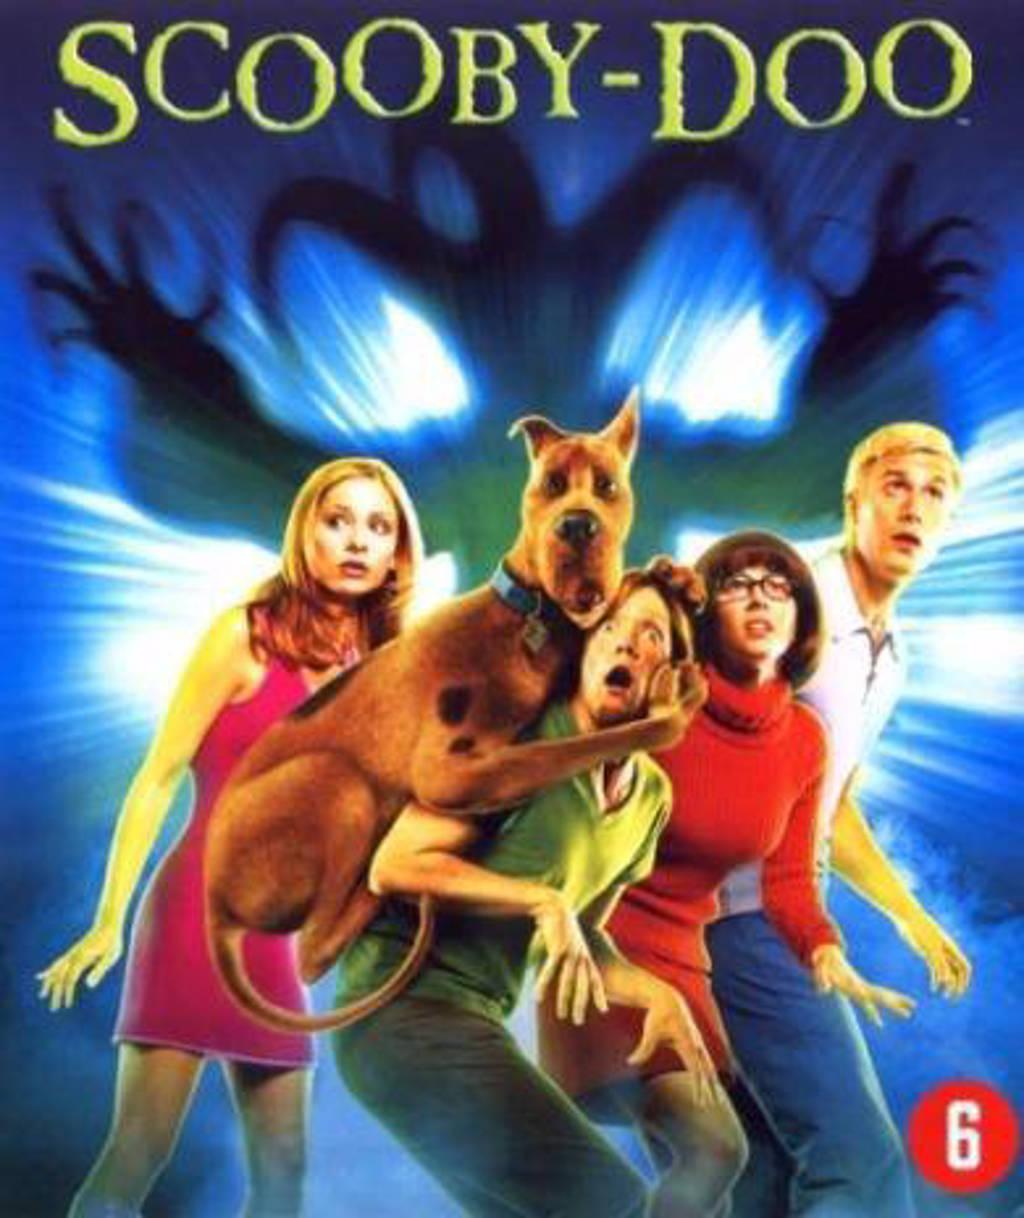 Scooby Doo - The movie (Blu-ray)